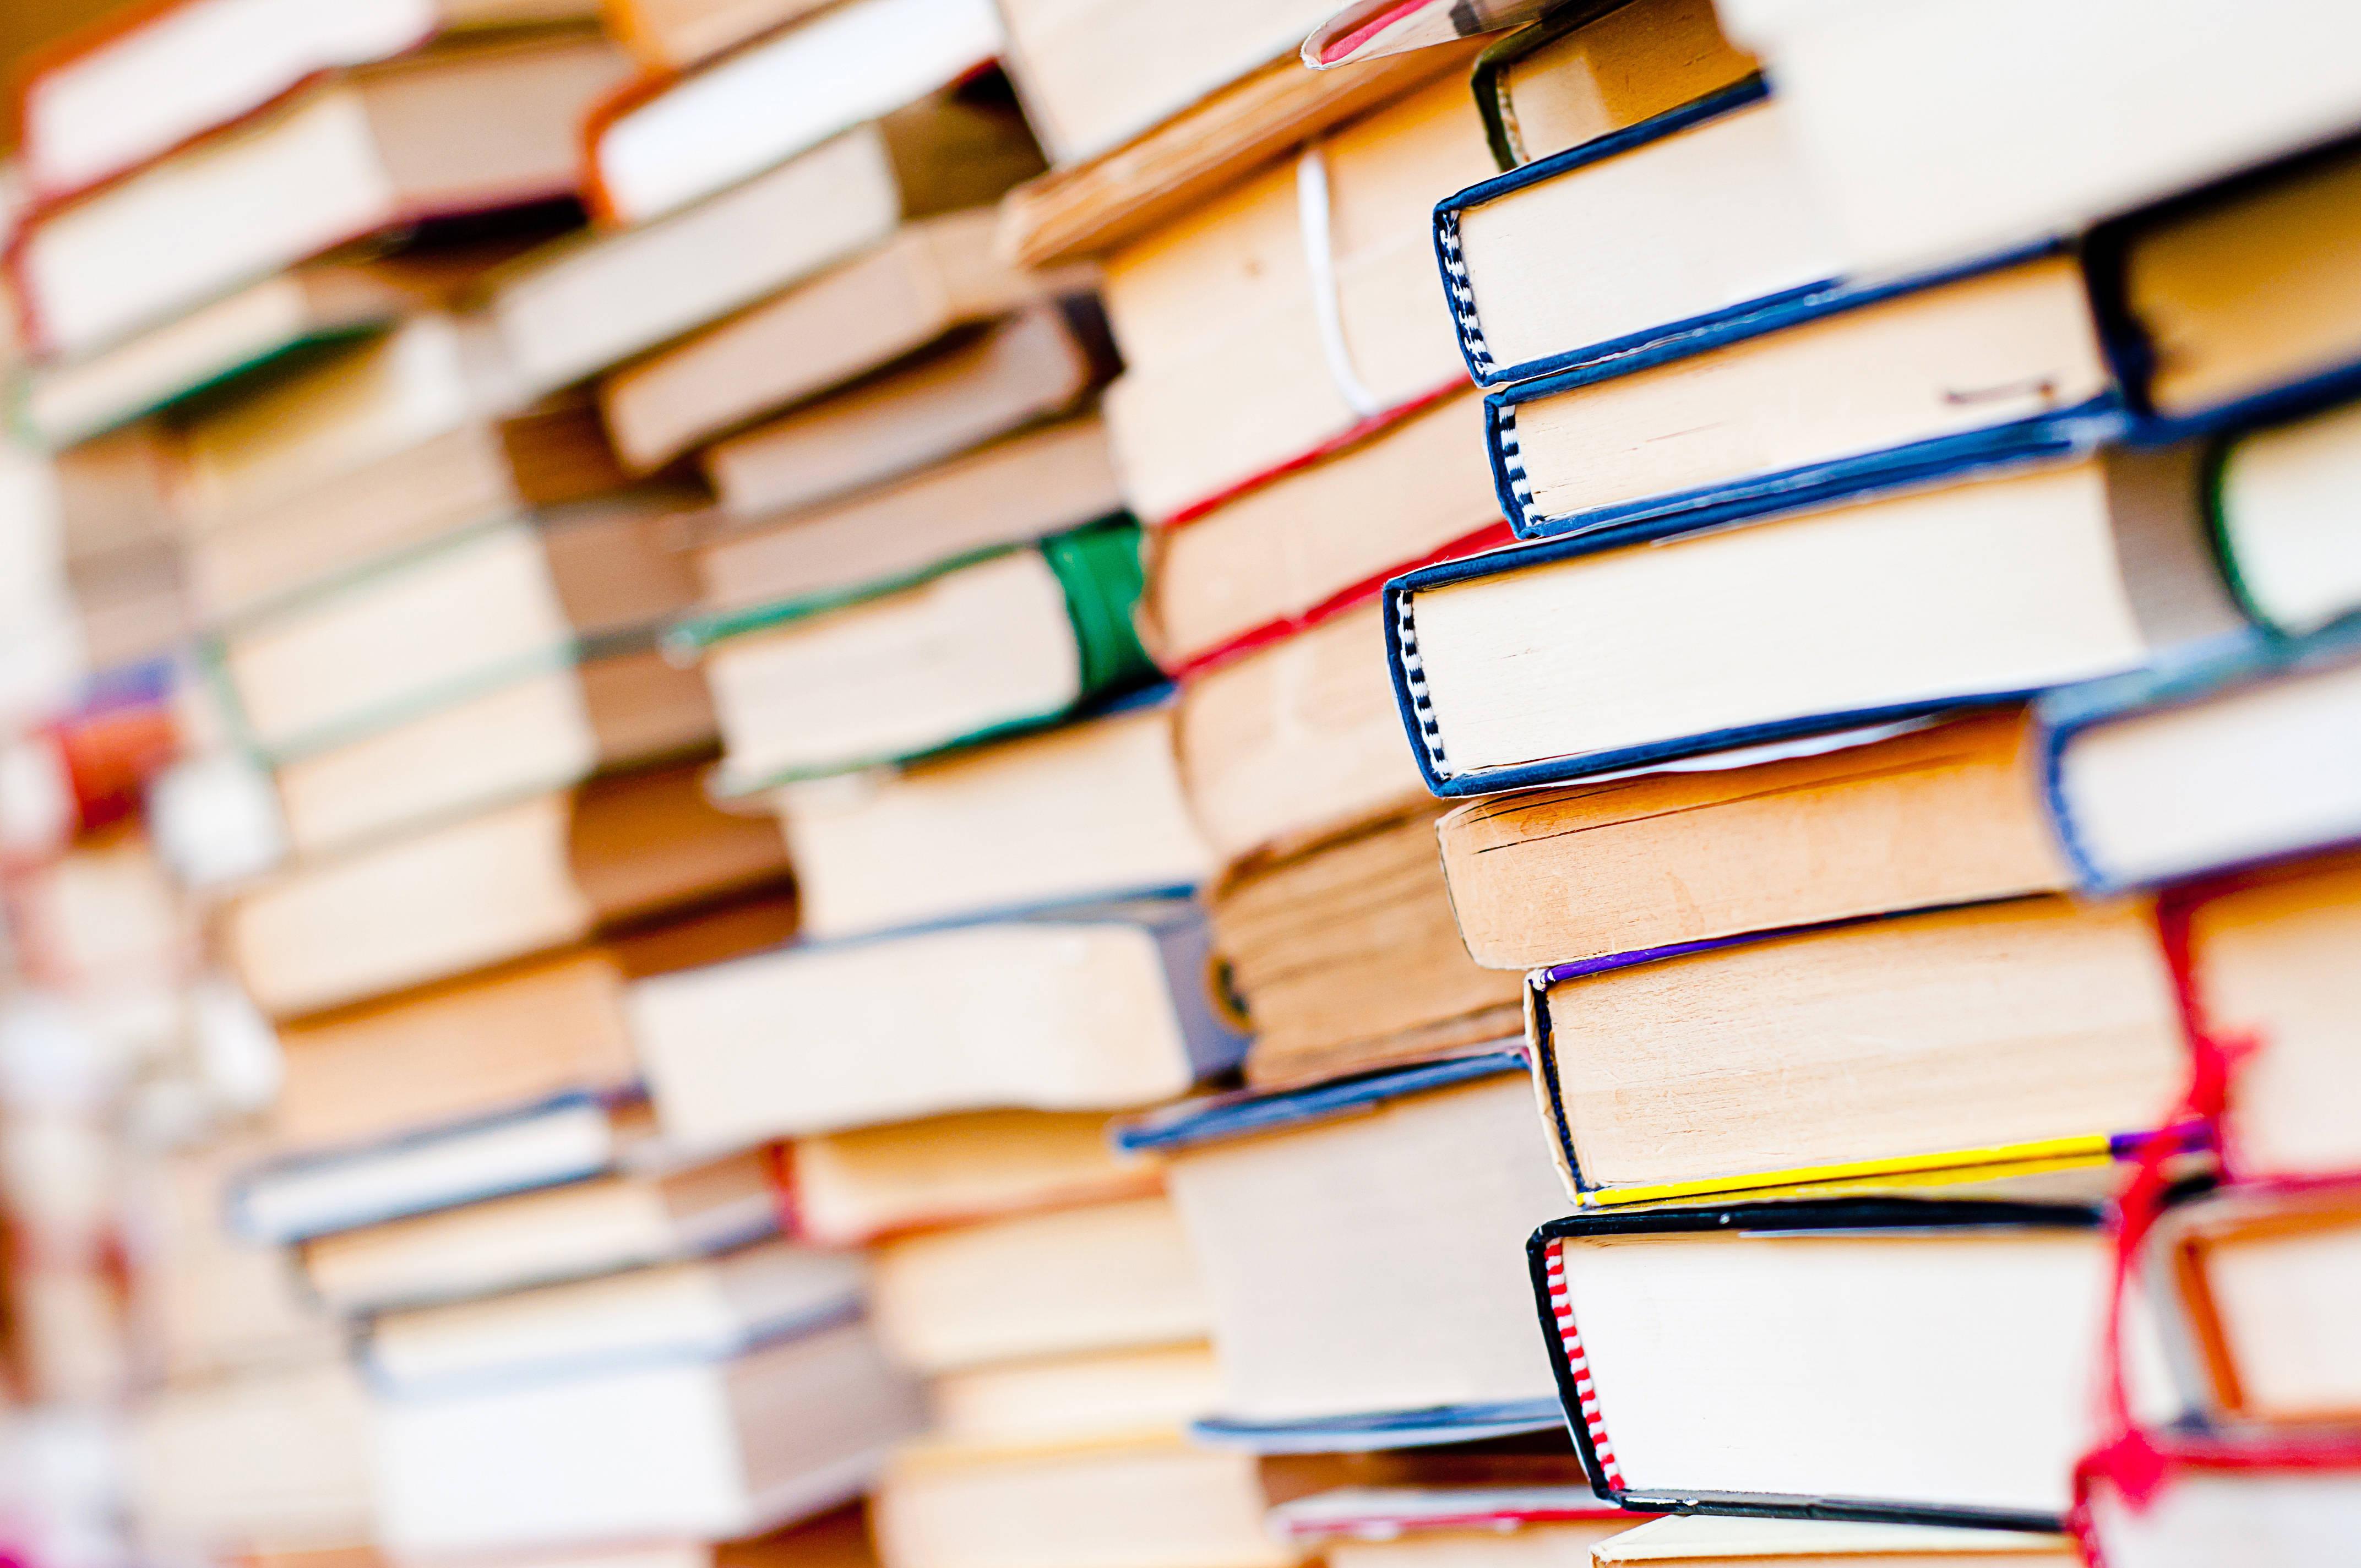 Montclair Public Library Director Chosen for National Free Speech Organization